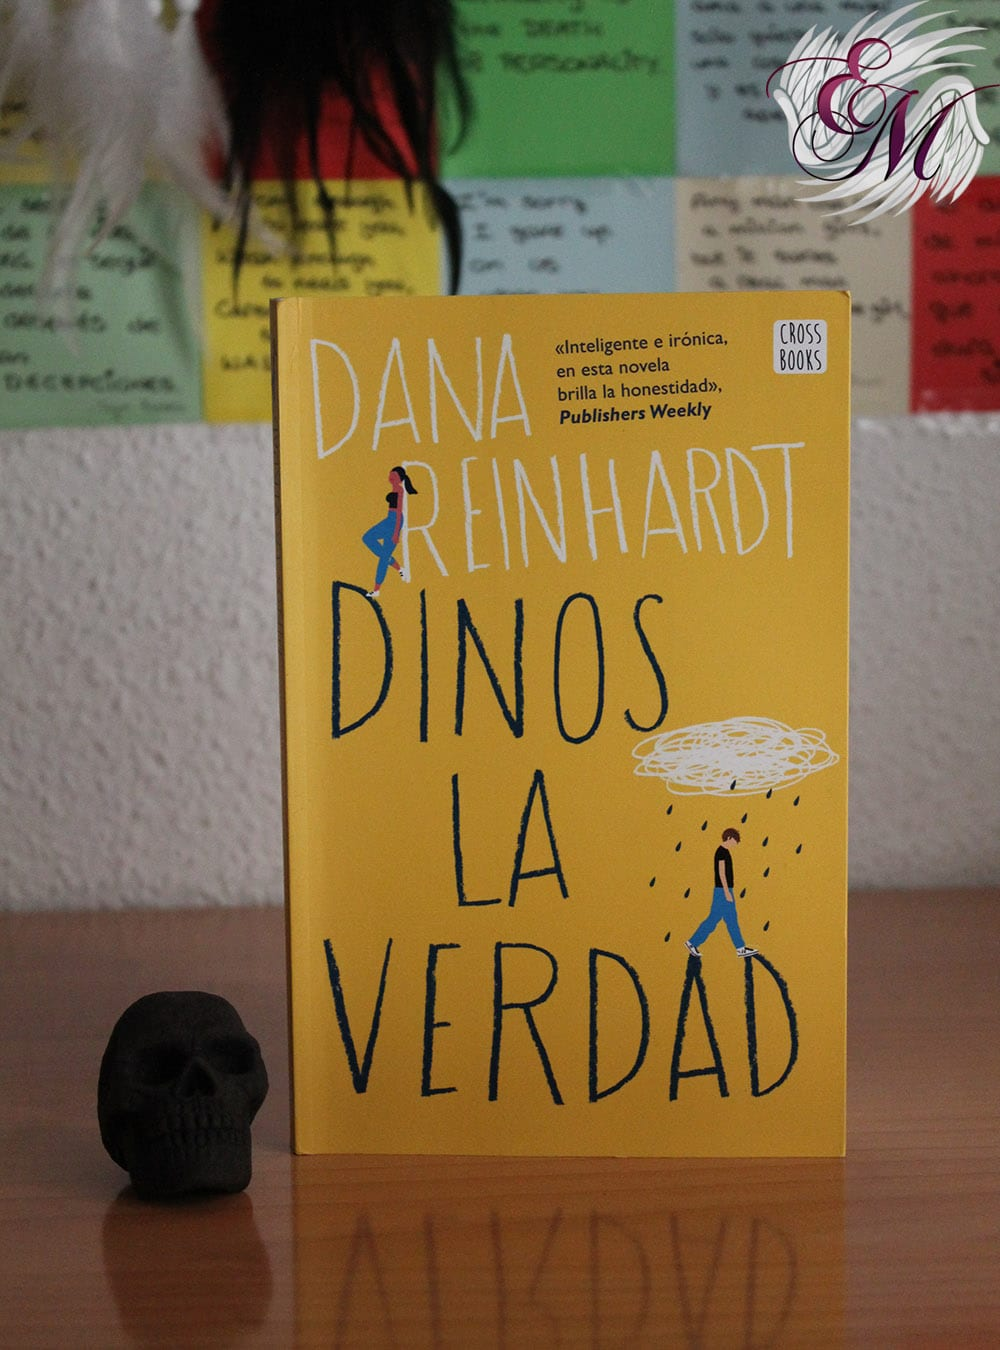 Dinos la verdad, de Dana Reinhardt – Reseña